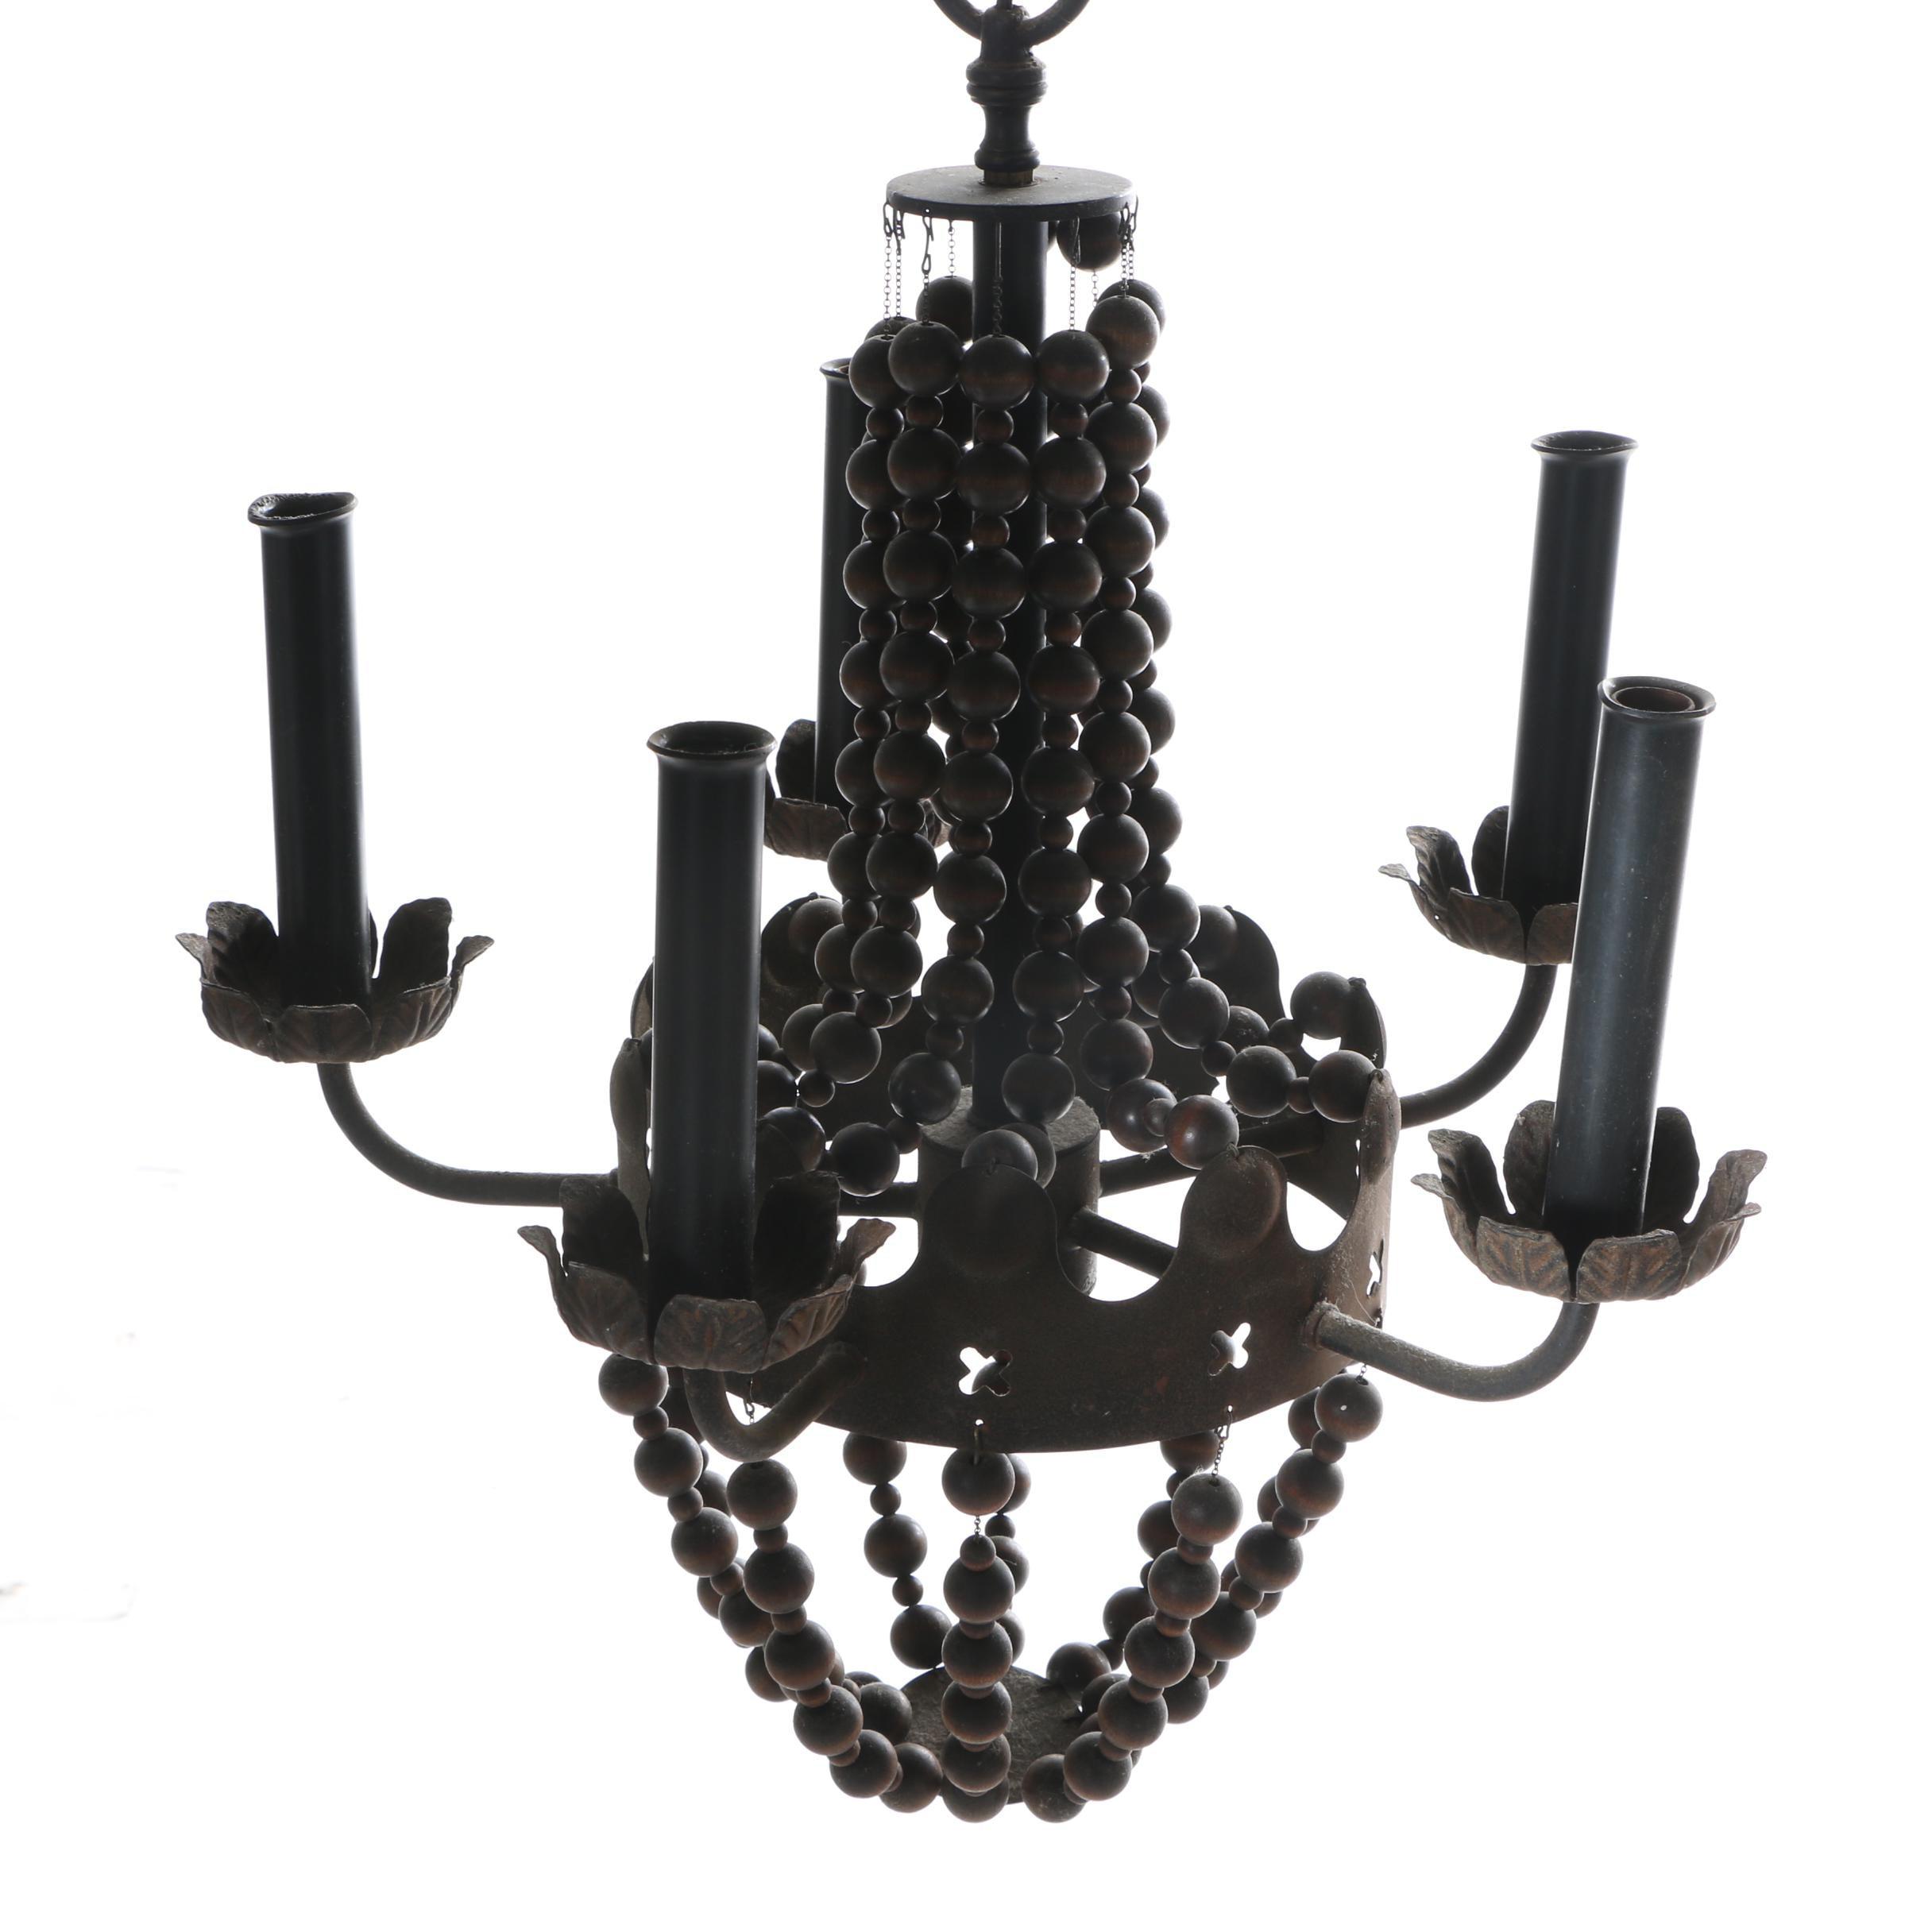 Vintage Bronze Chandelier with Brown Wooden Beads